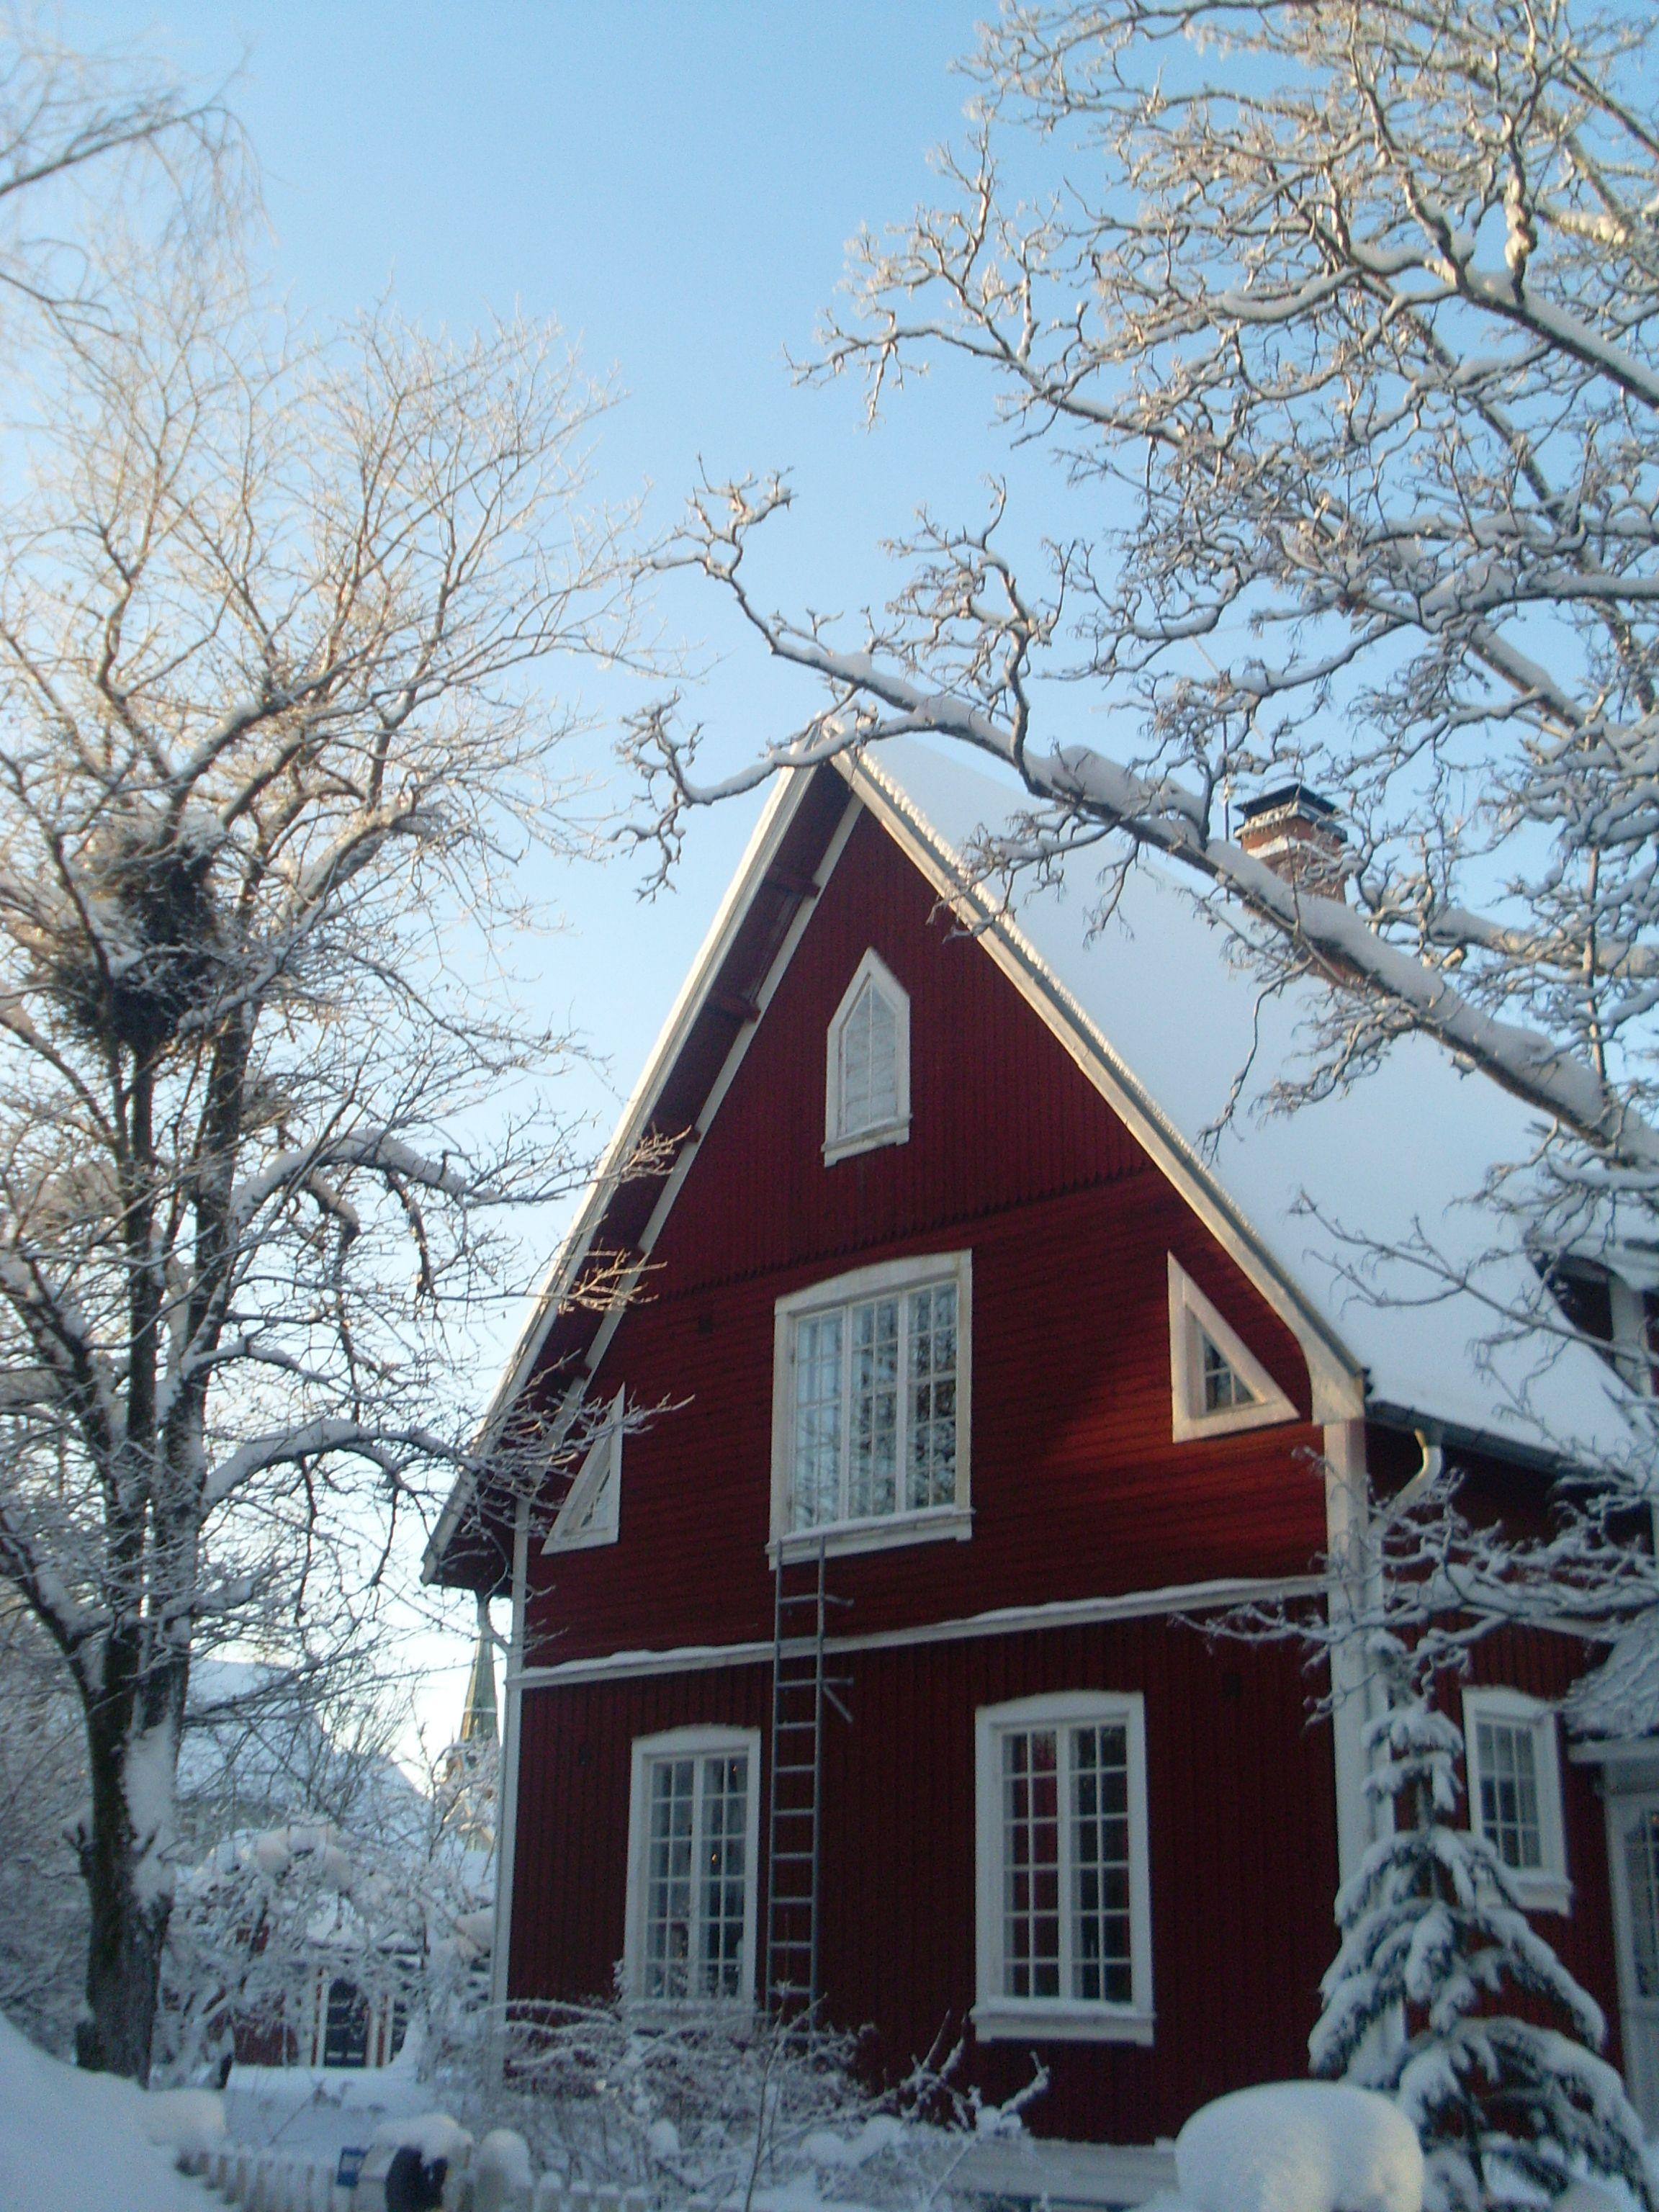 Cute Swedish House Sweden House Norwegian House Swedish House